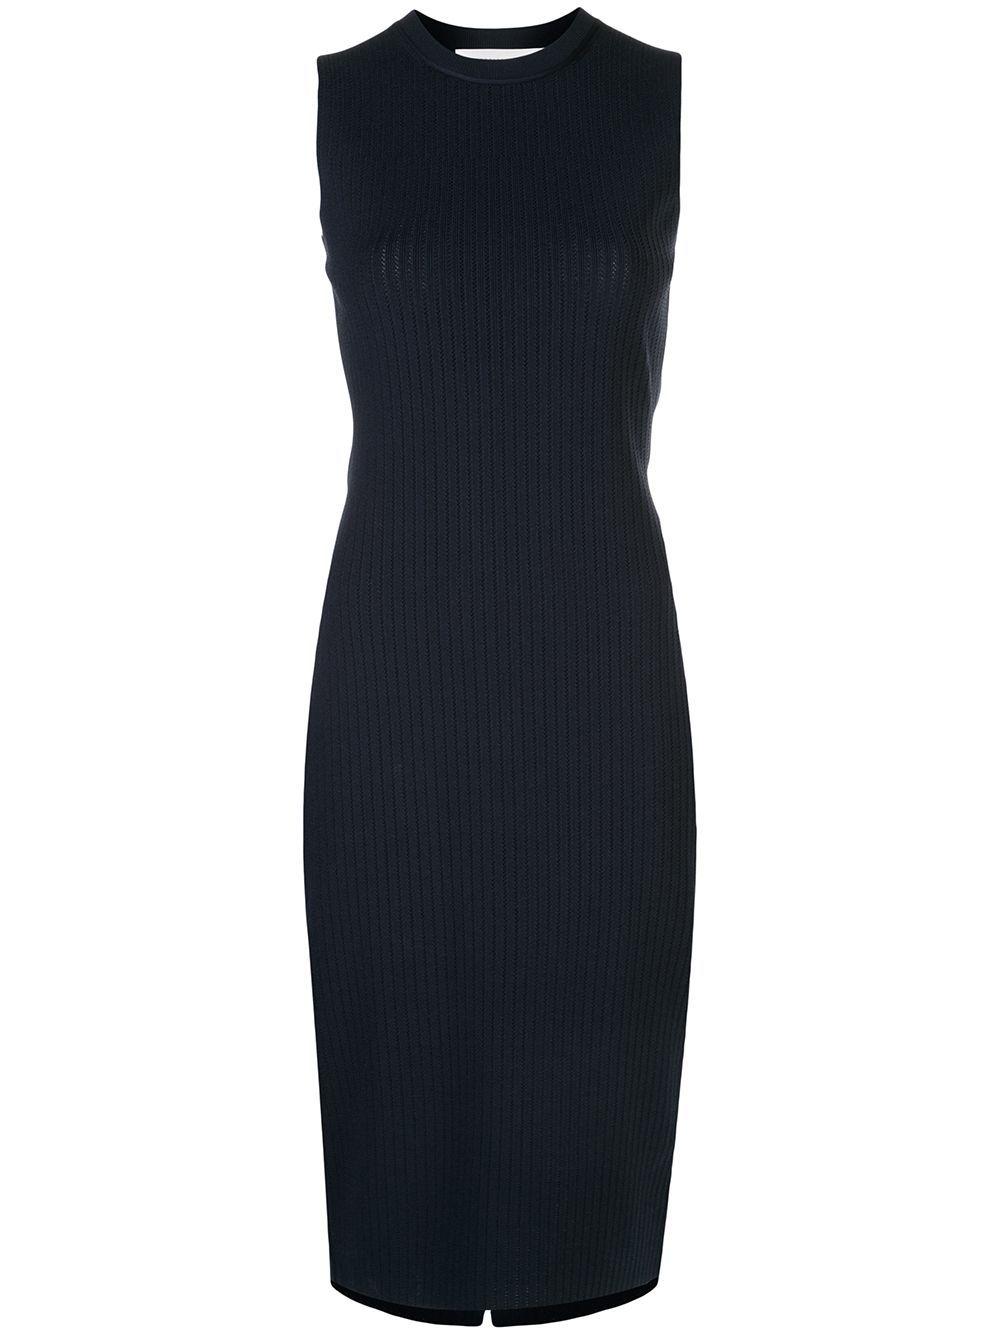 Victoria Beckham Knitted Ribbed Midi Dress Farfetch Ribbed Knit Dress Ribbed Midi Dress Knit Dress [ 1334 x 1000 Pixel ]